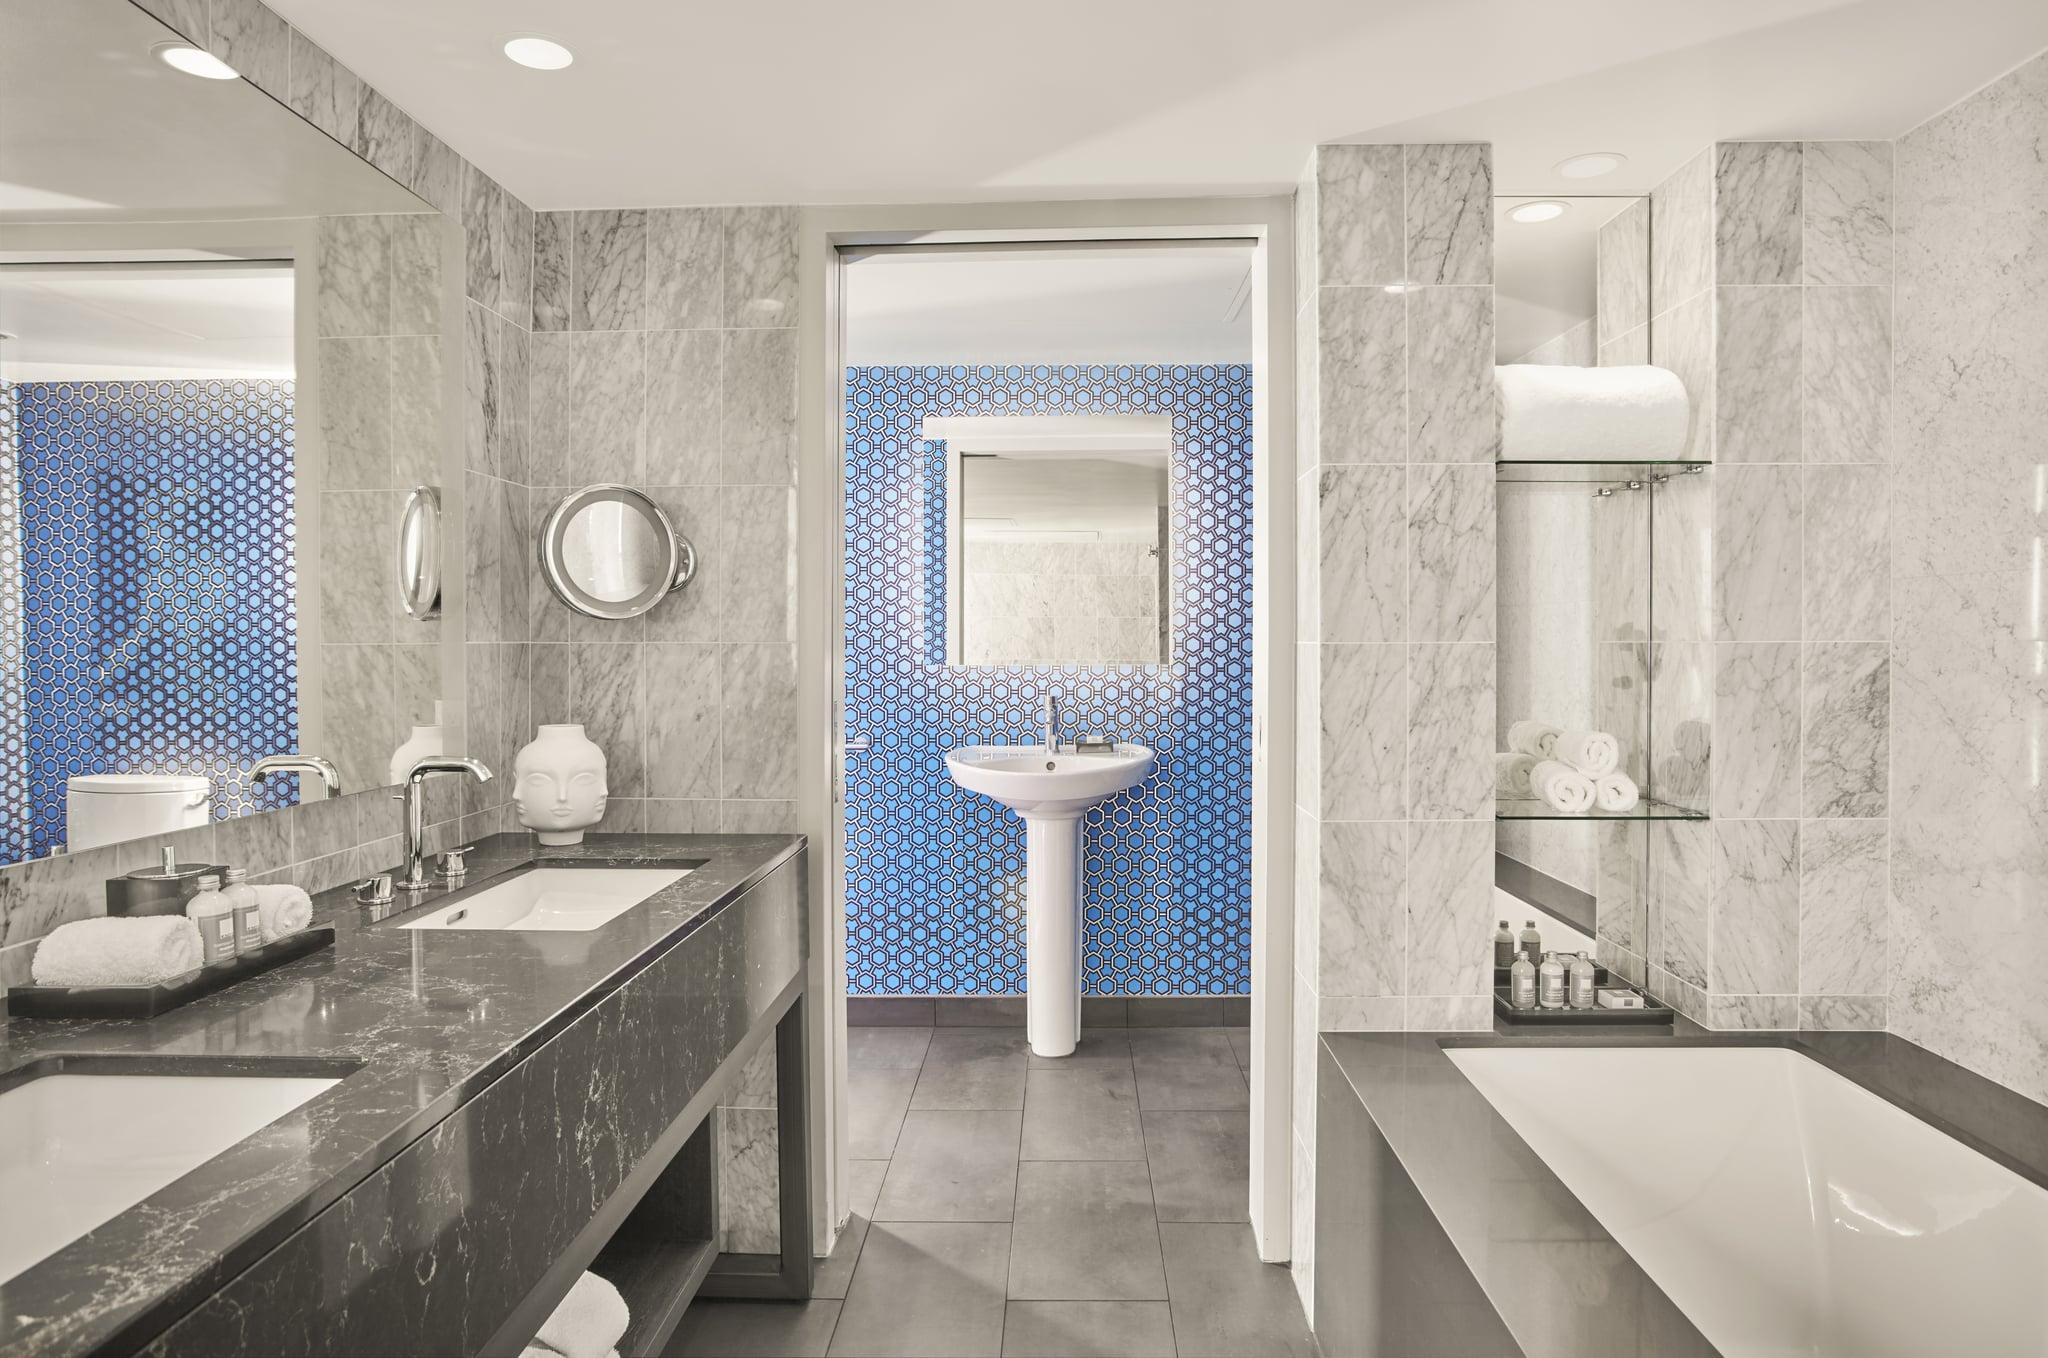 jonathan adler on 2017 design trends popsugar home